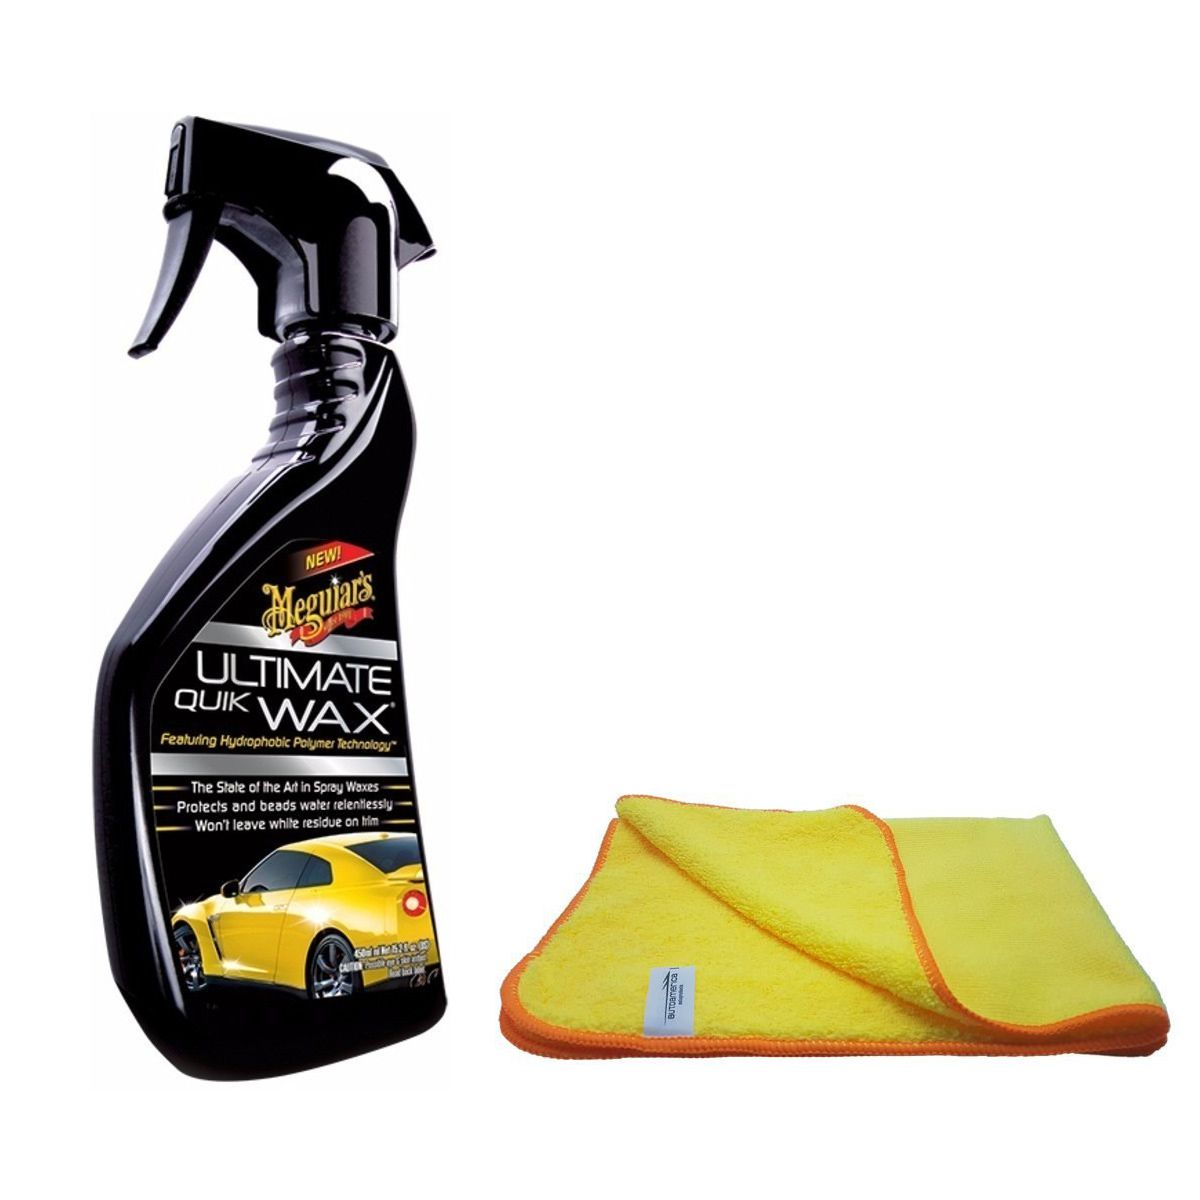 Kit Cera Spray Quik Wax Meguiars + Flanela de Microfibra 40x60 Autoamerica